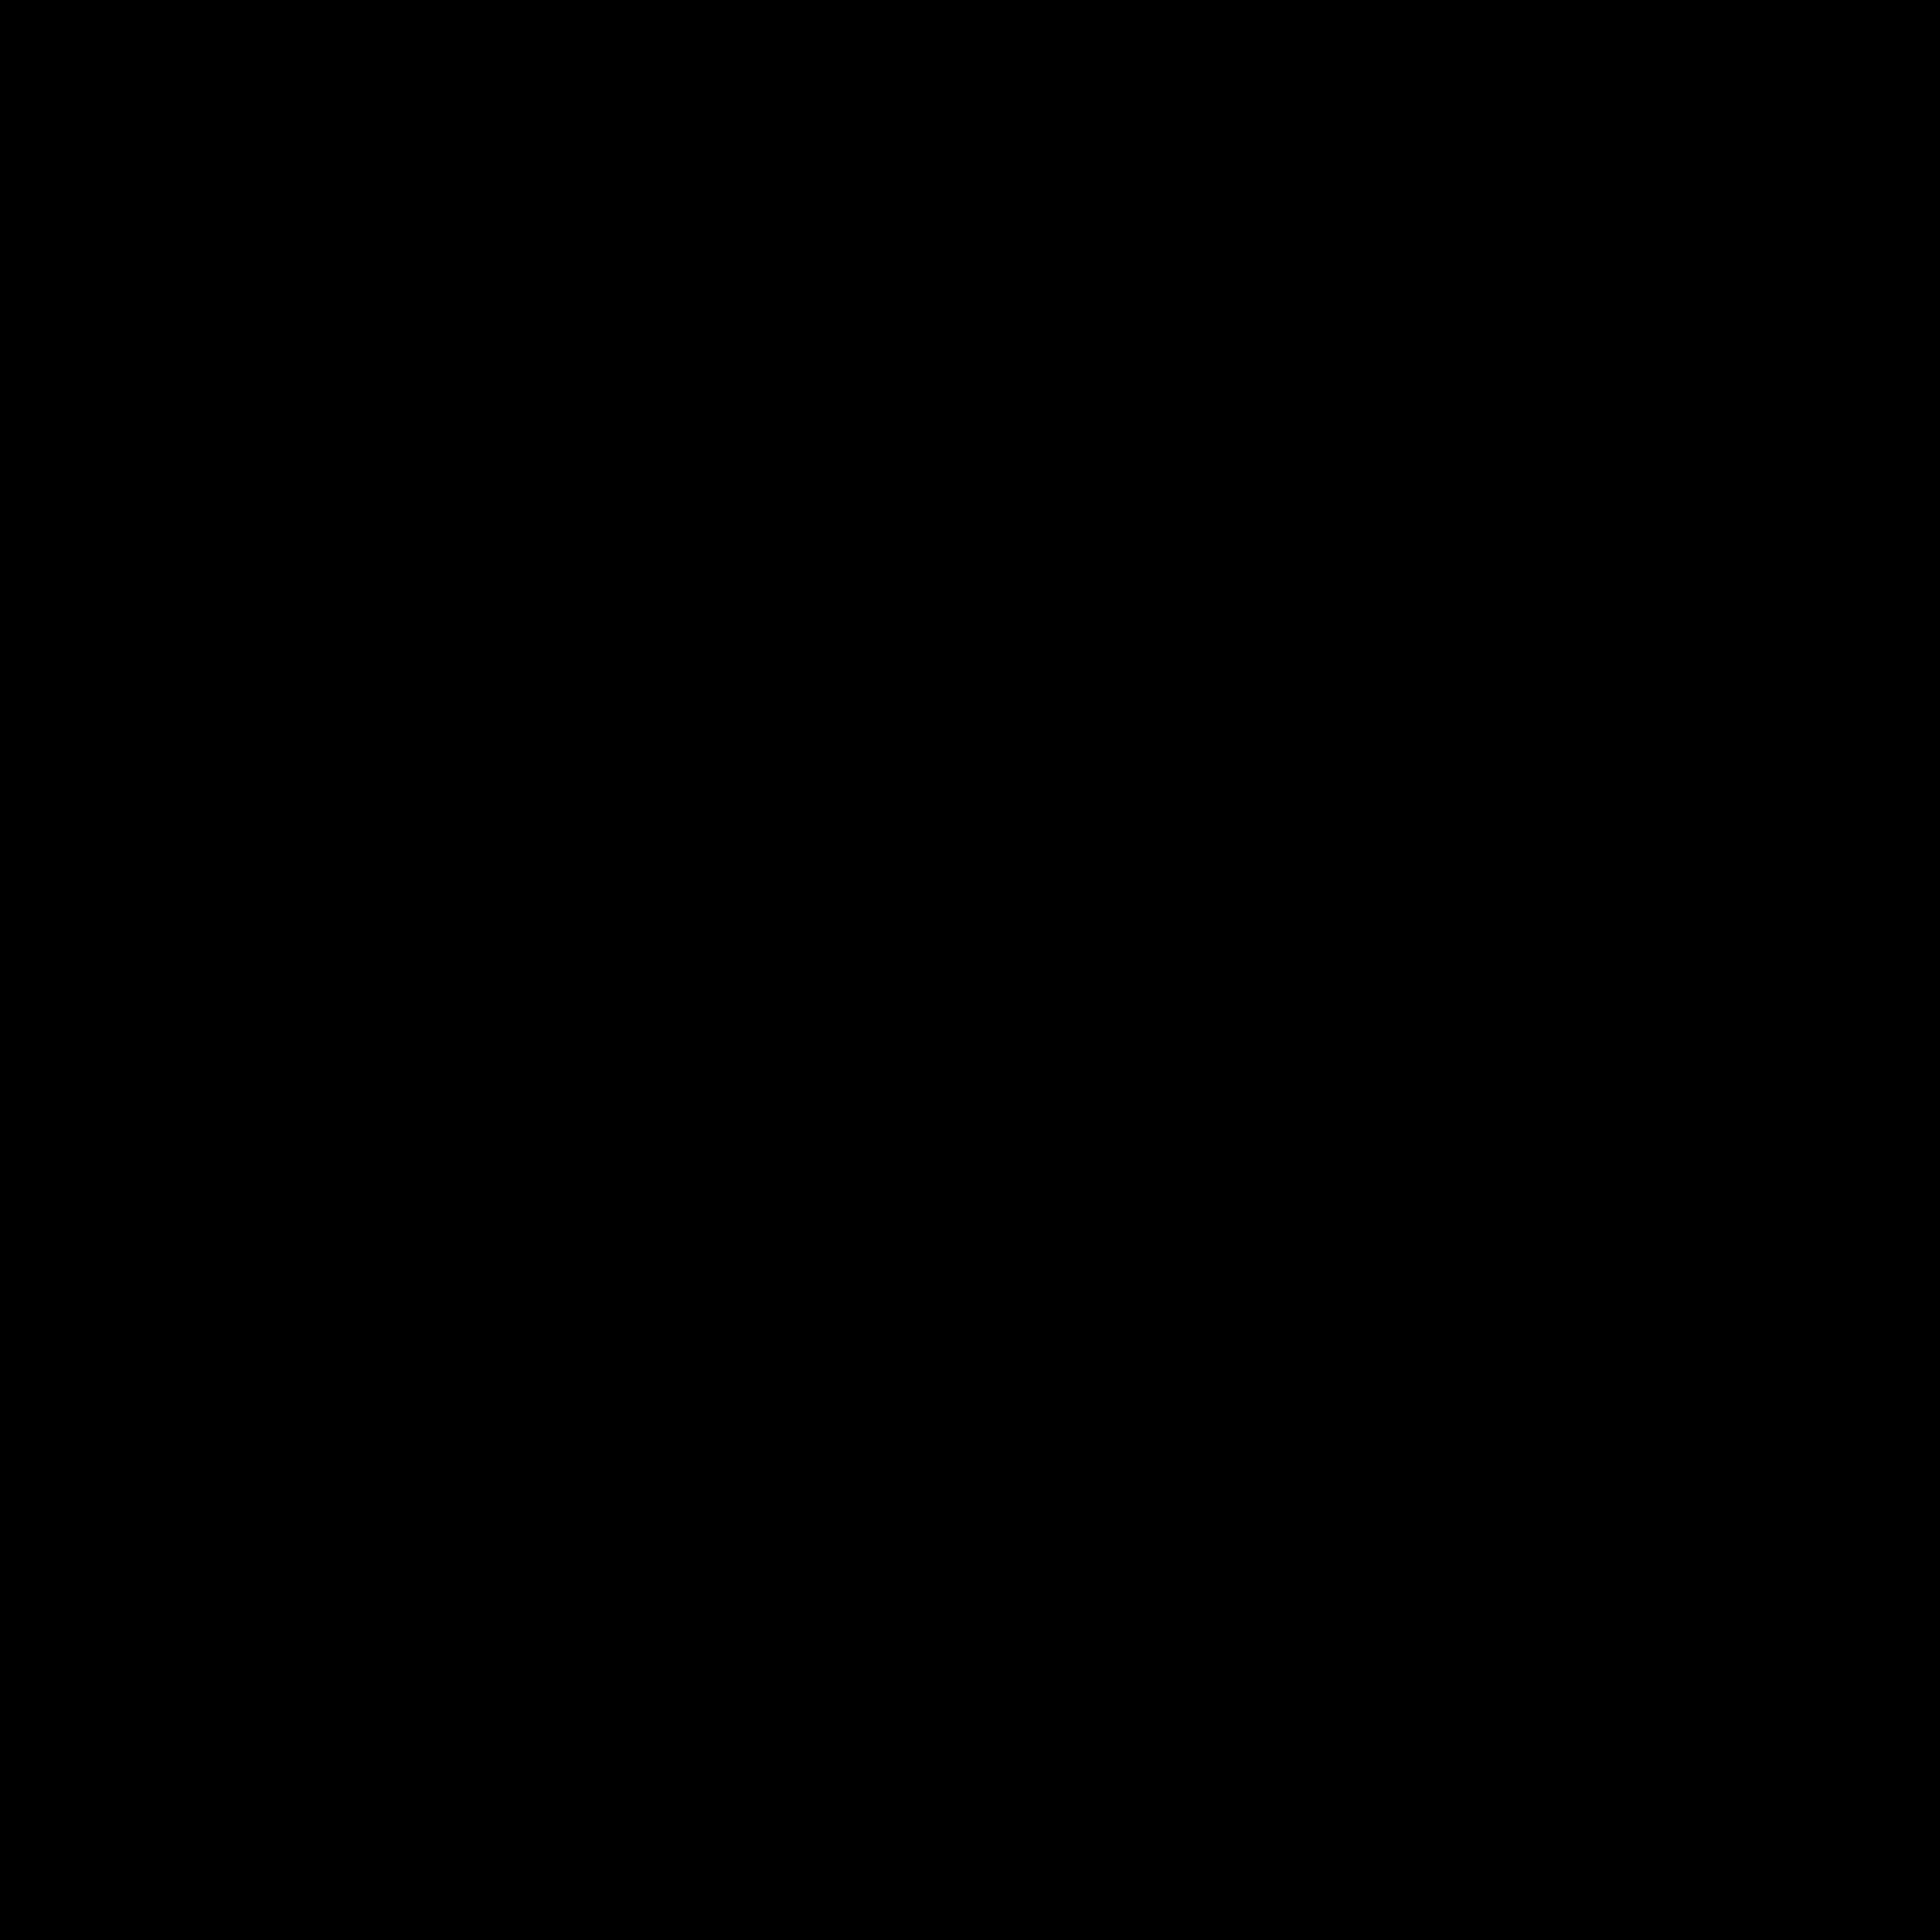 200px-Triathlon_pictogram.svg.png